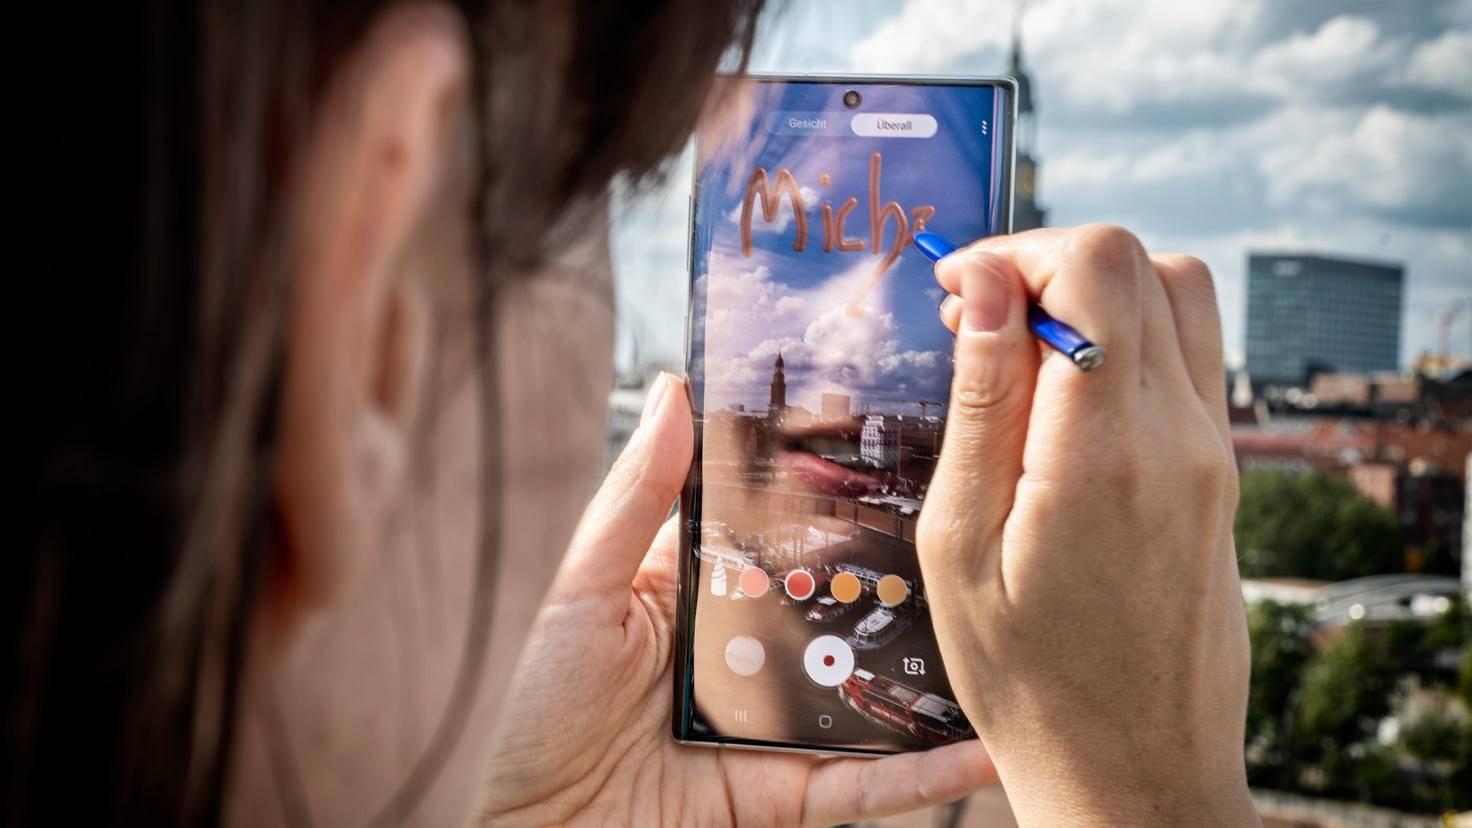 Galaxy Note 10 Plus AR-Doodle